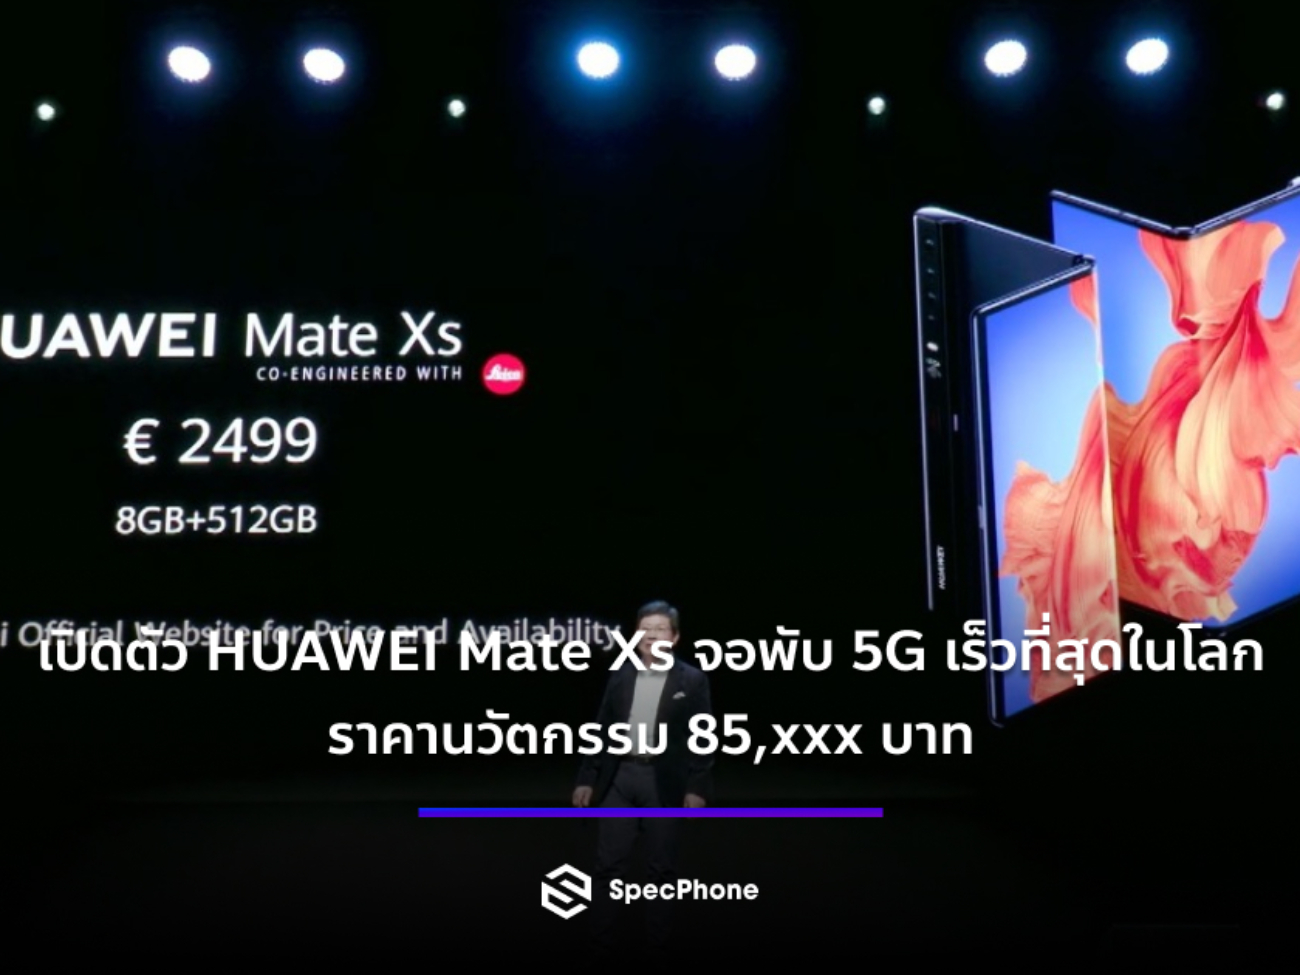 HUAWEI-Mate-Xs-Cover